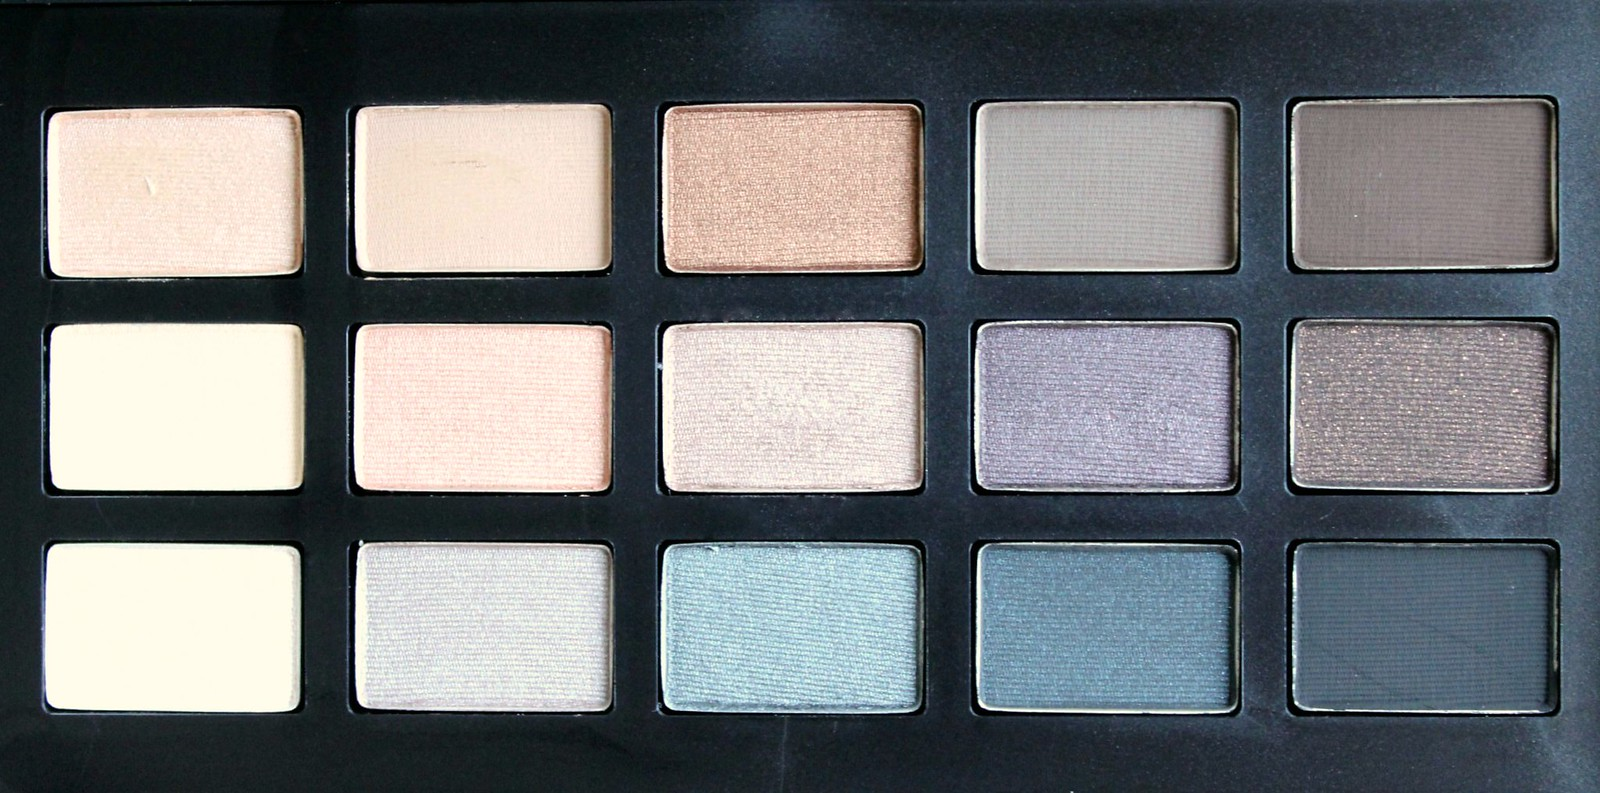 NARSissist Palette Eyeshadow